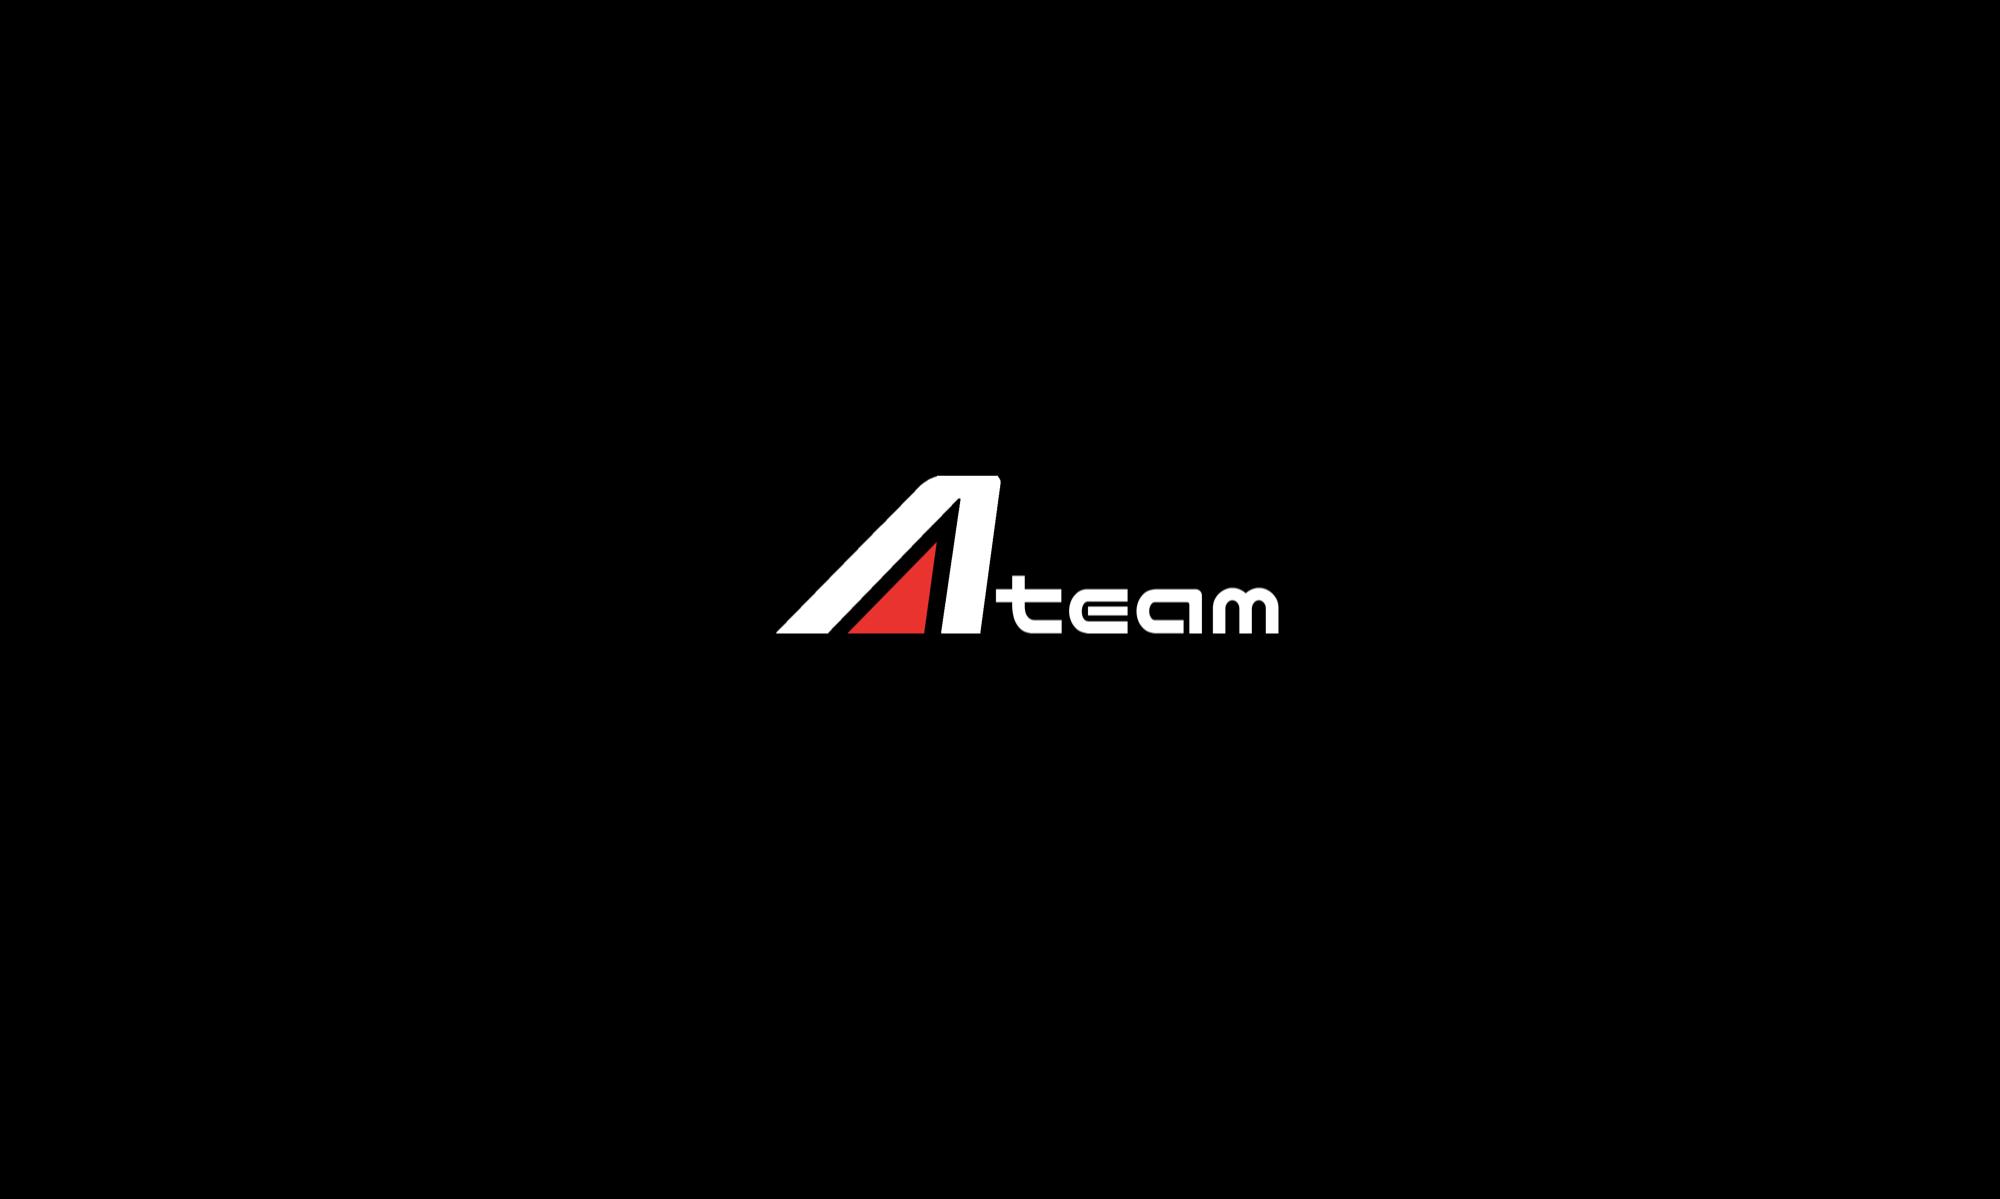 A-TEAM Corporation